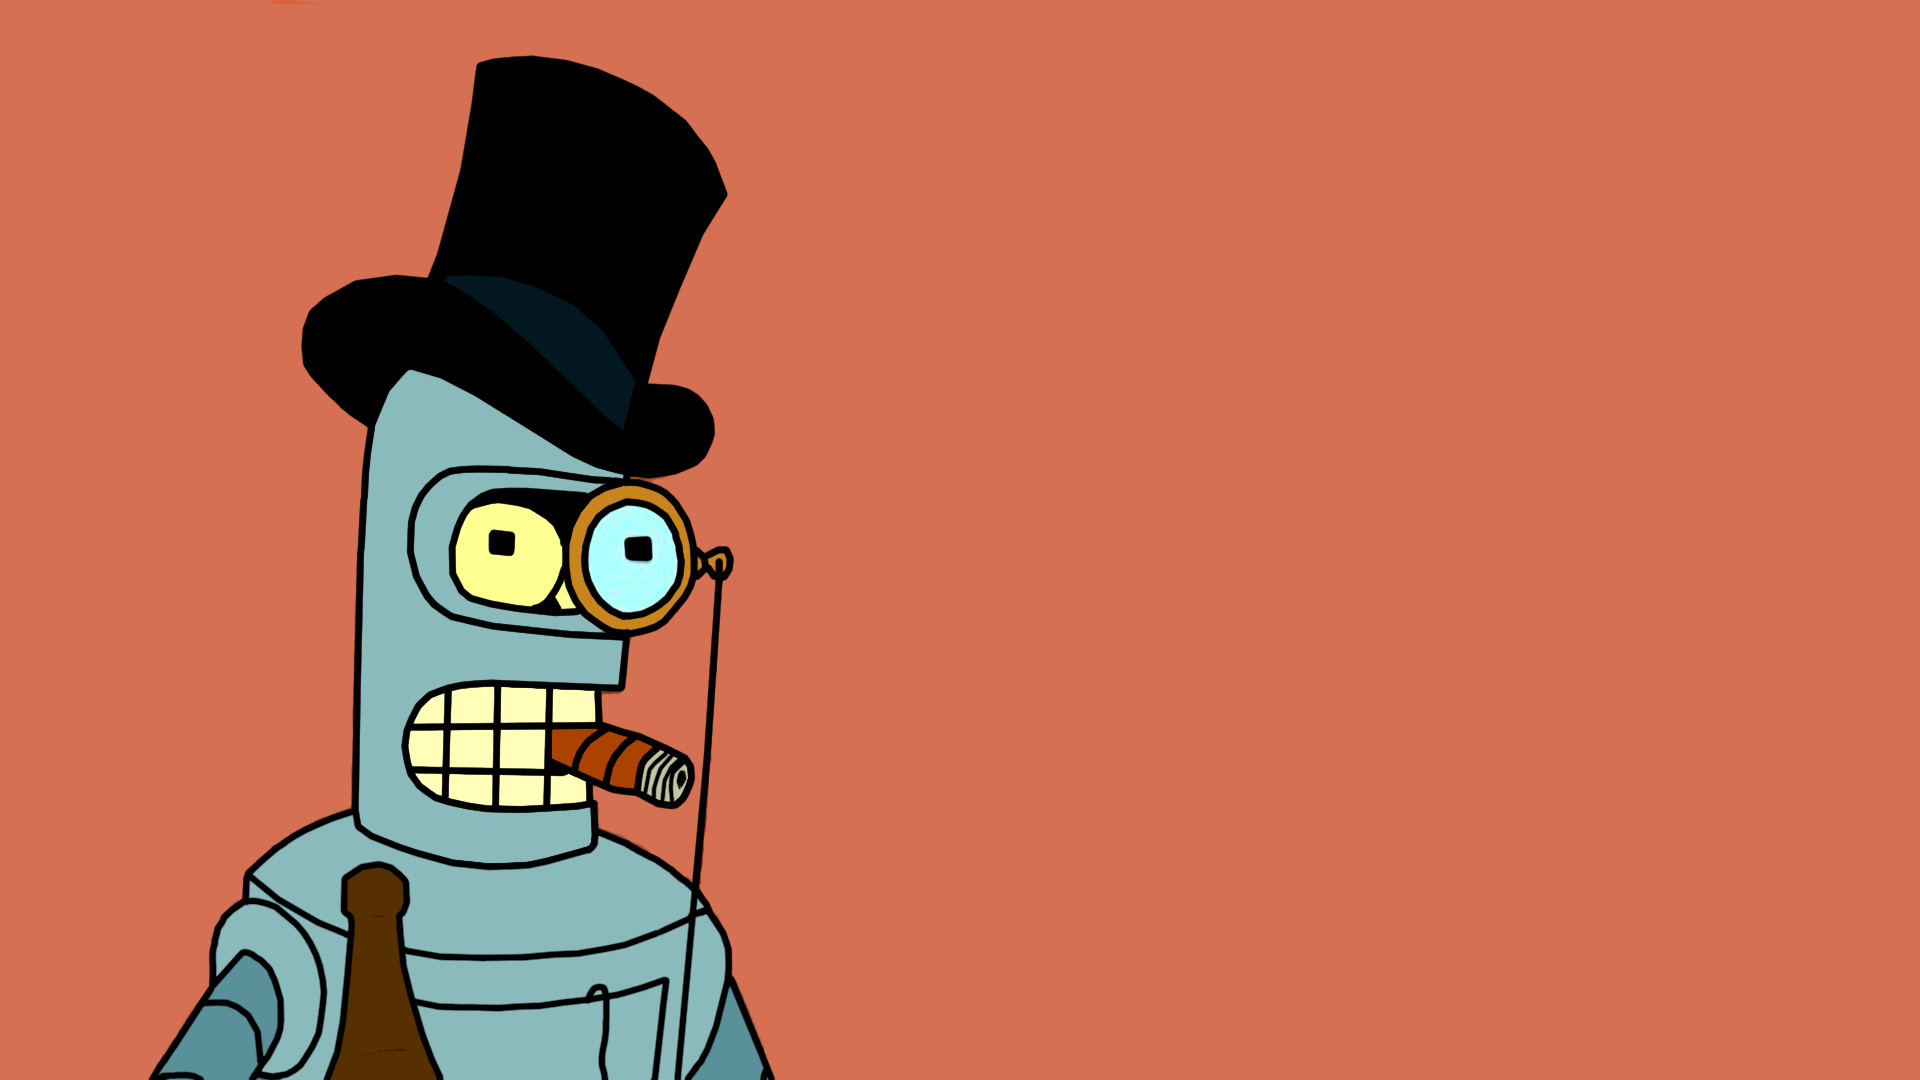 Bender dating site